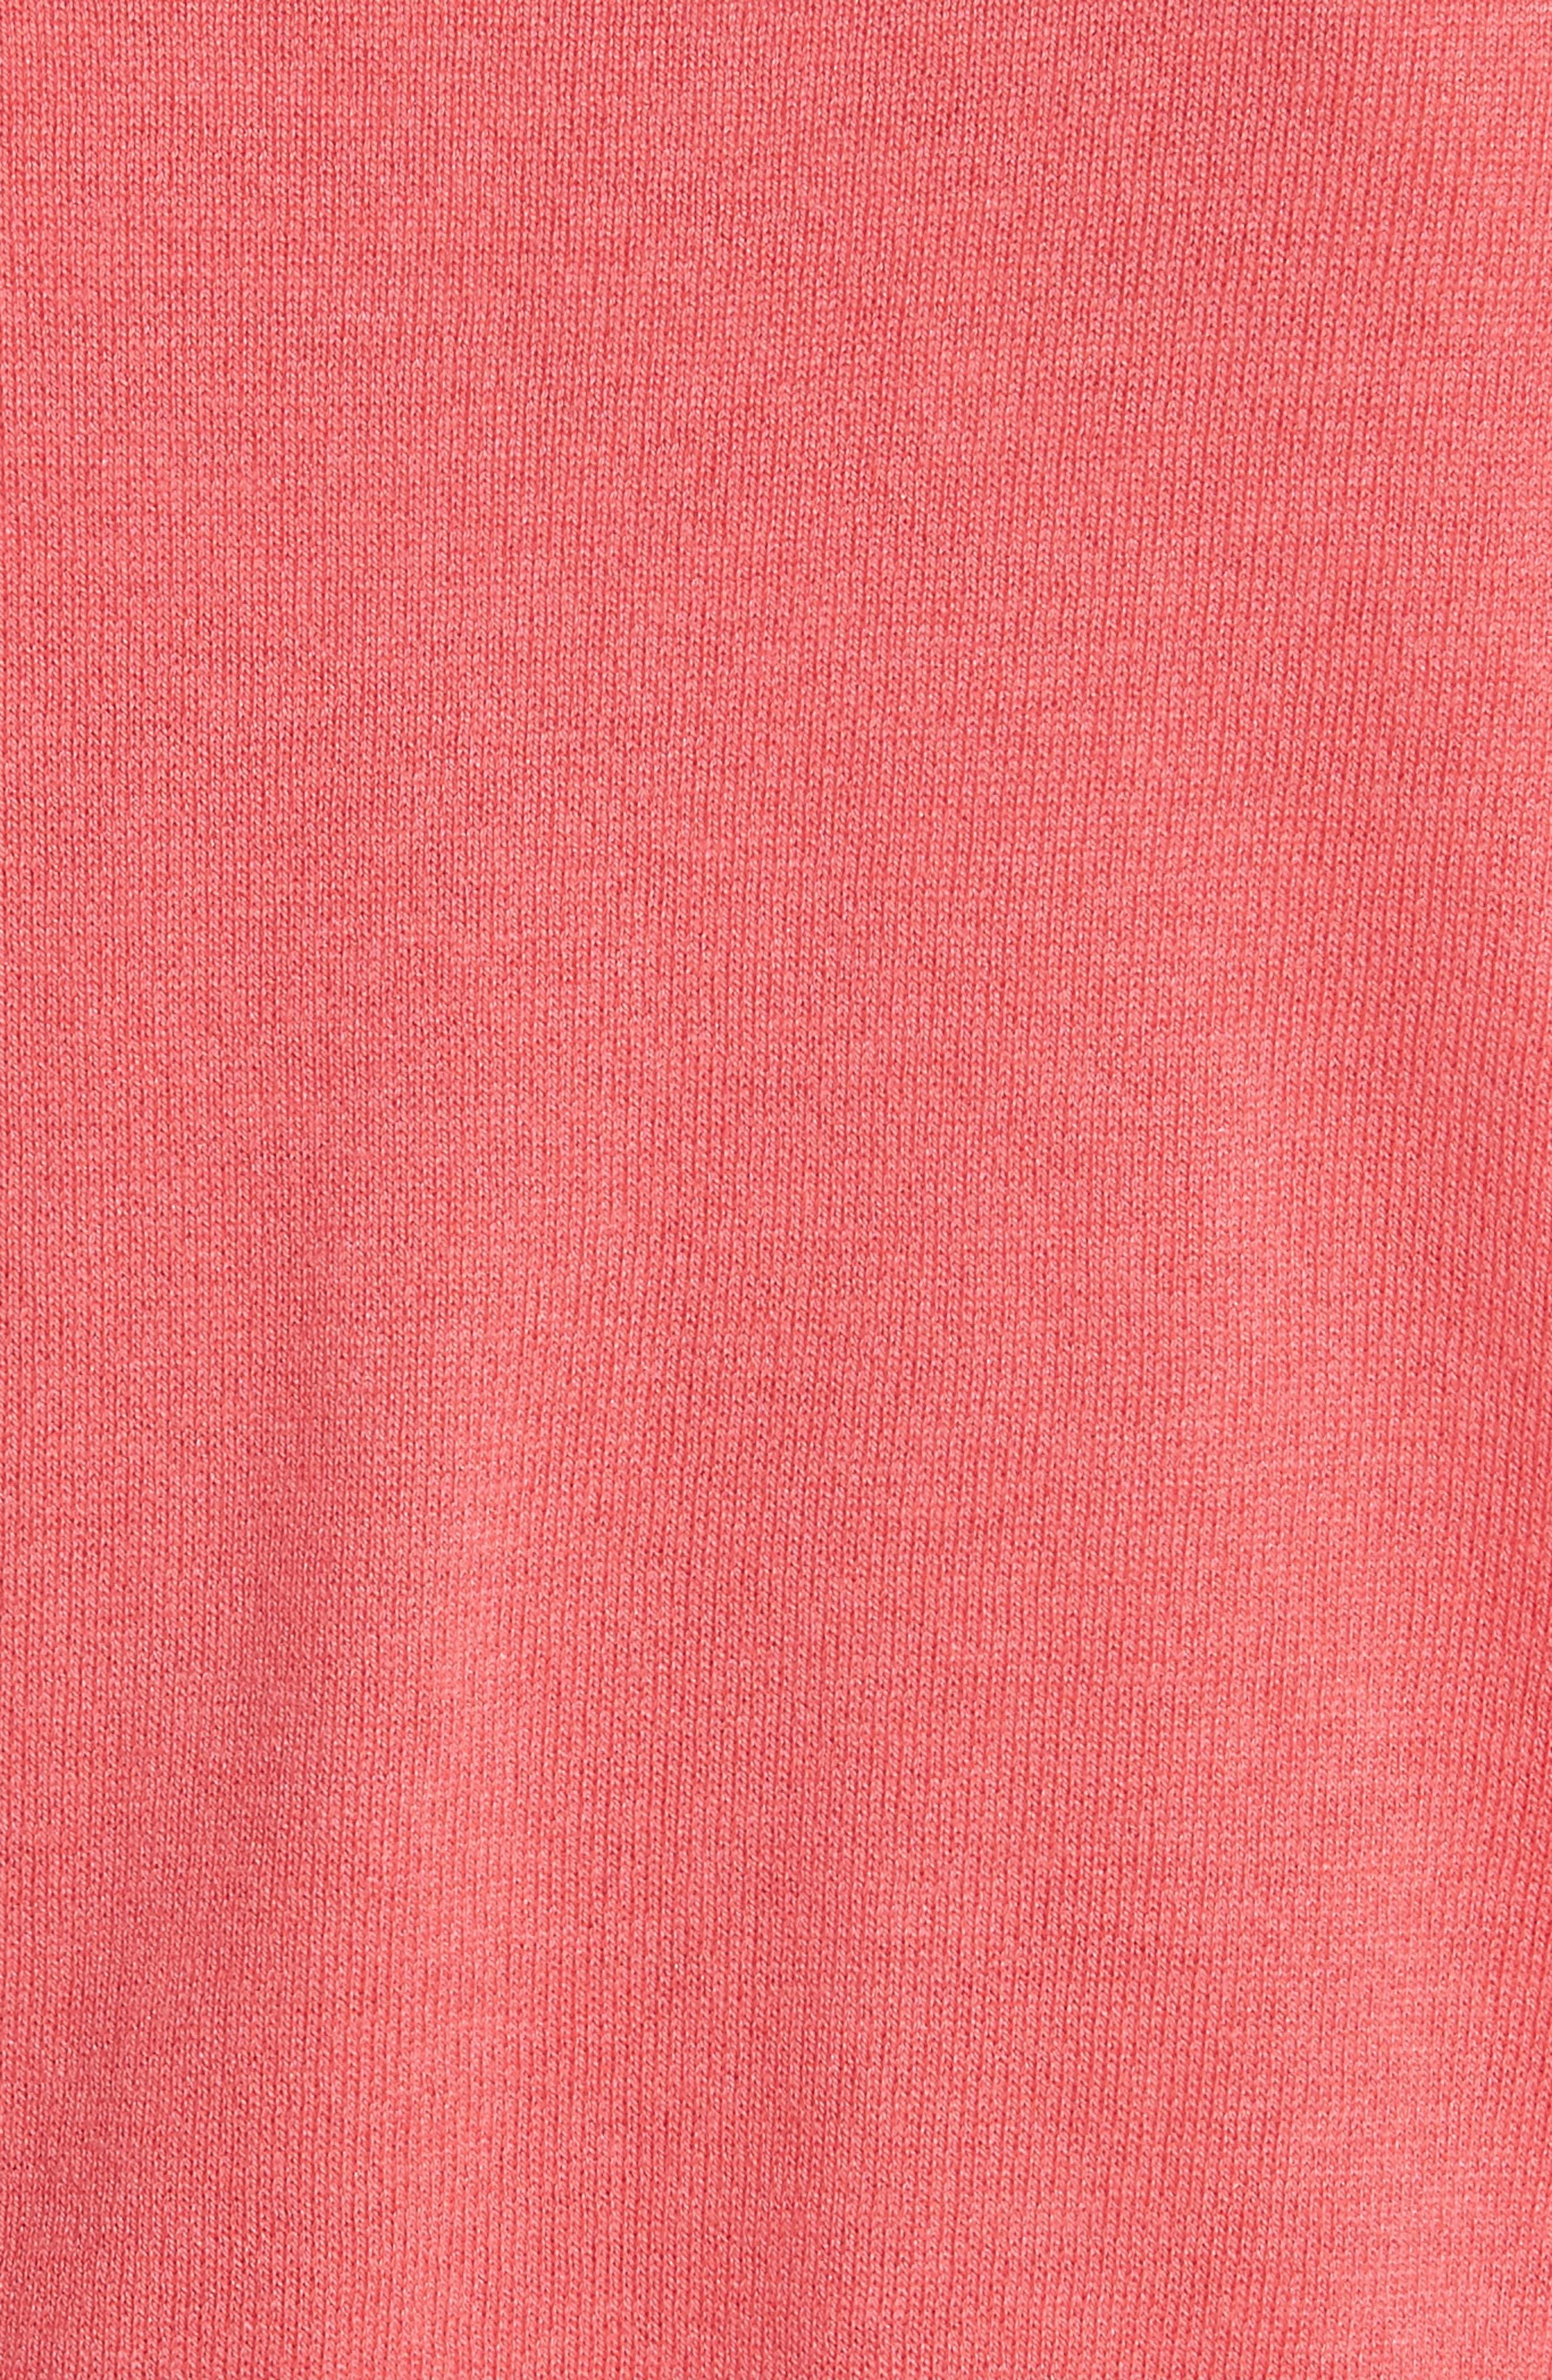 jewel button crop cardigan,                             Alternate thumbnail 5, color,                             Peach Sherbet